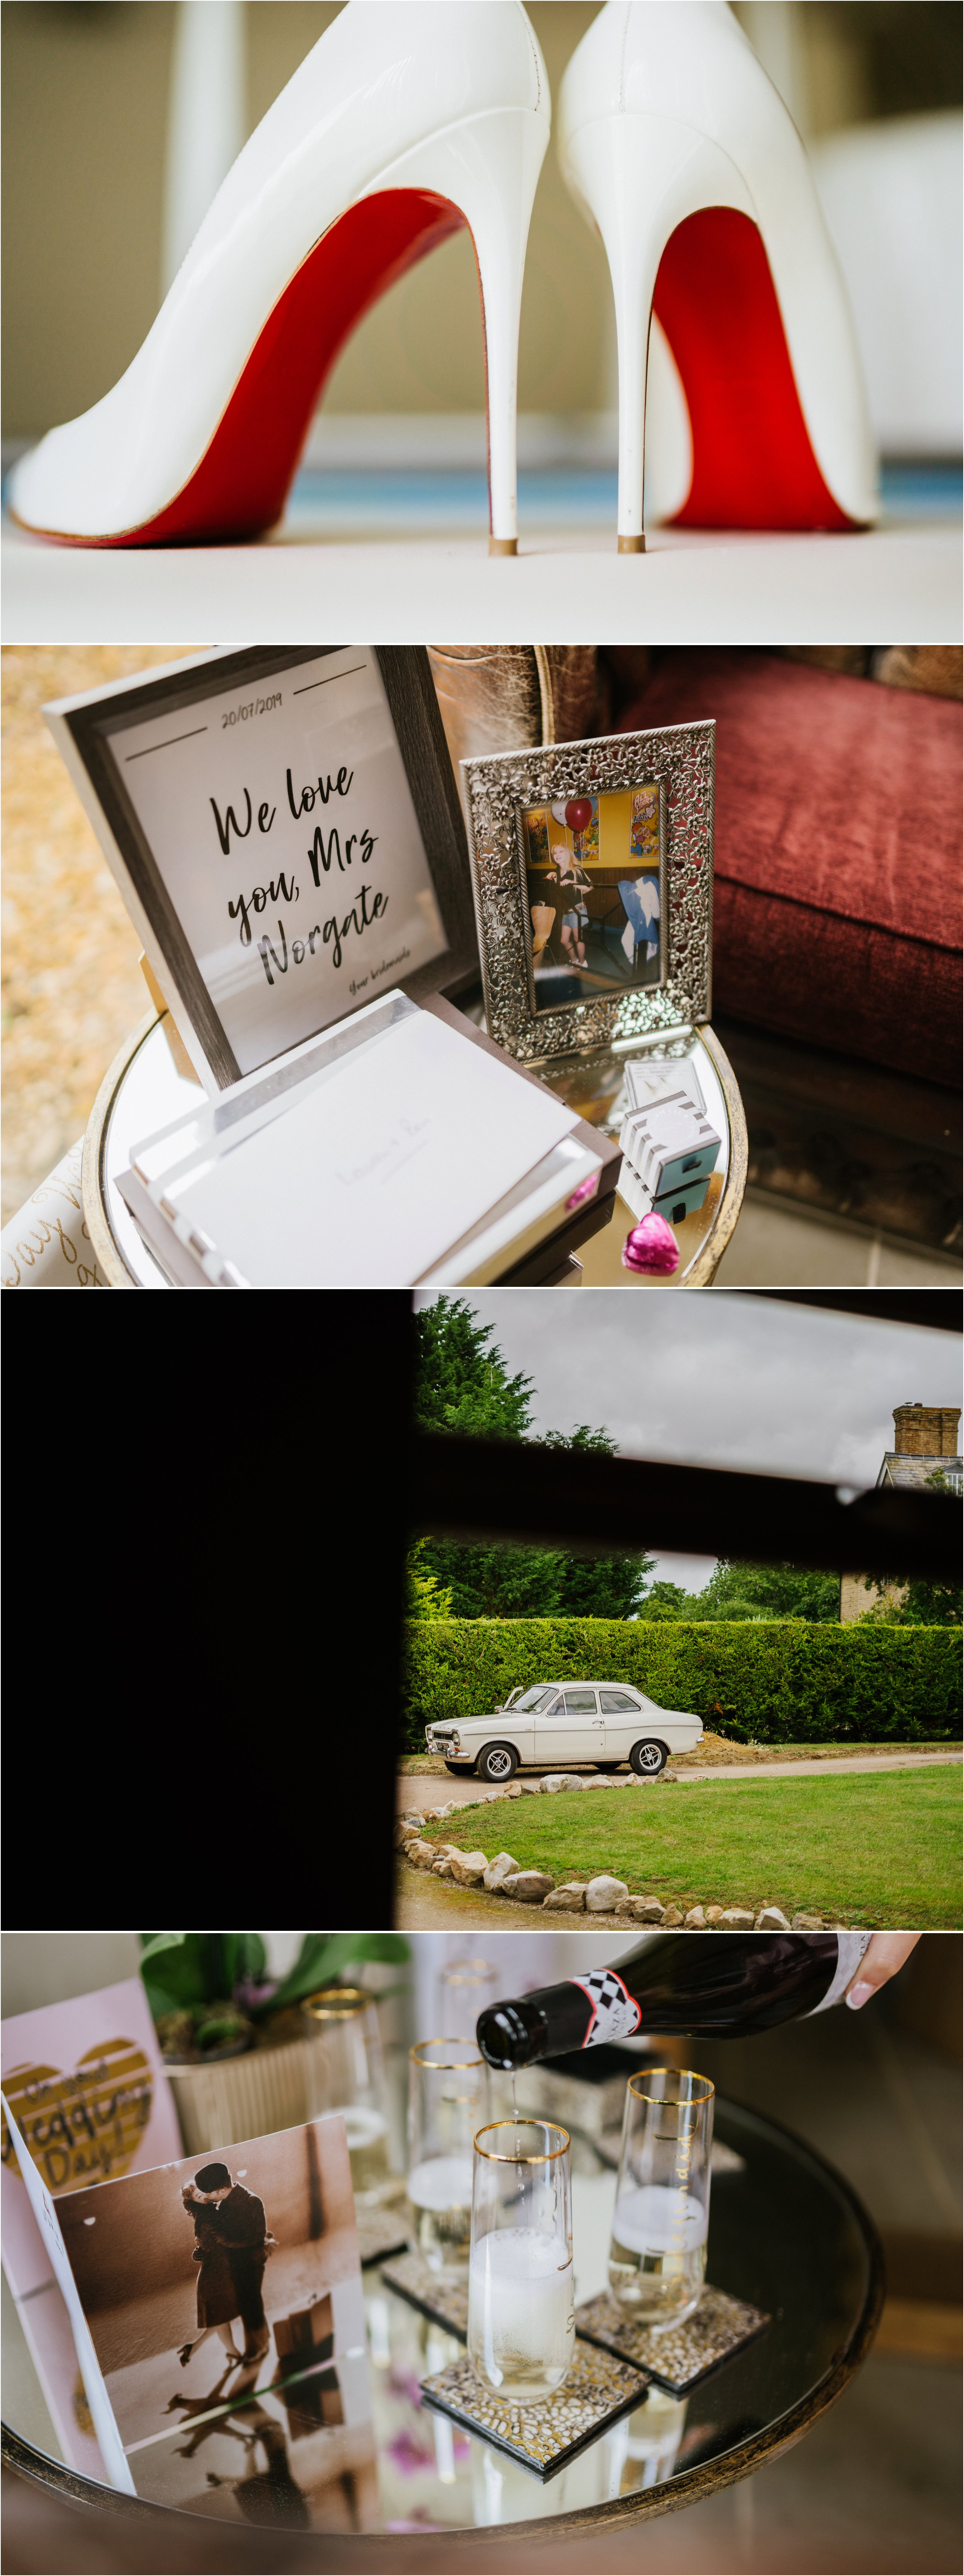 Compton Verney wedding photography_0005.jpg